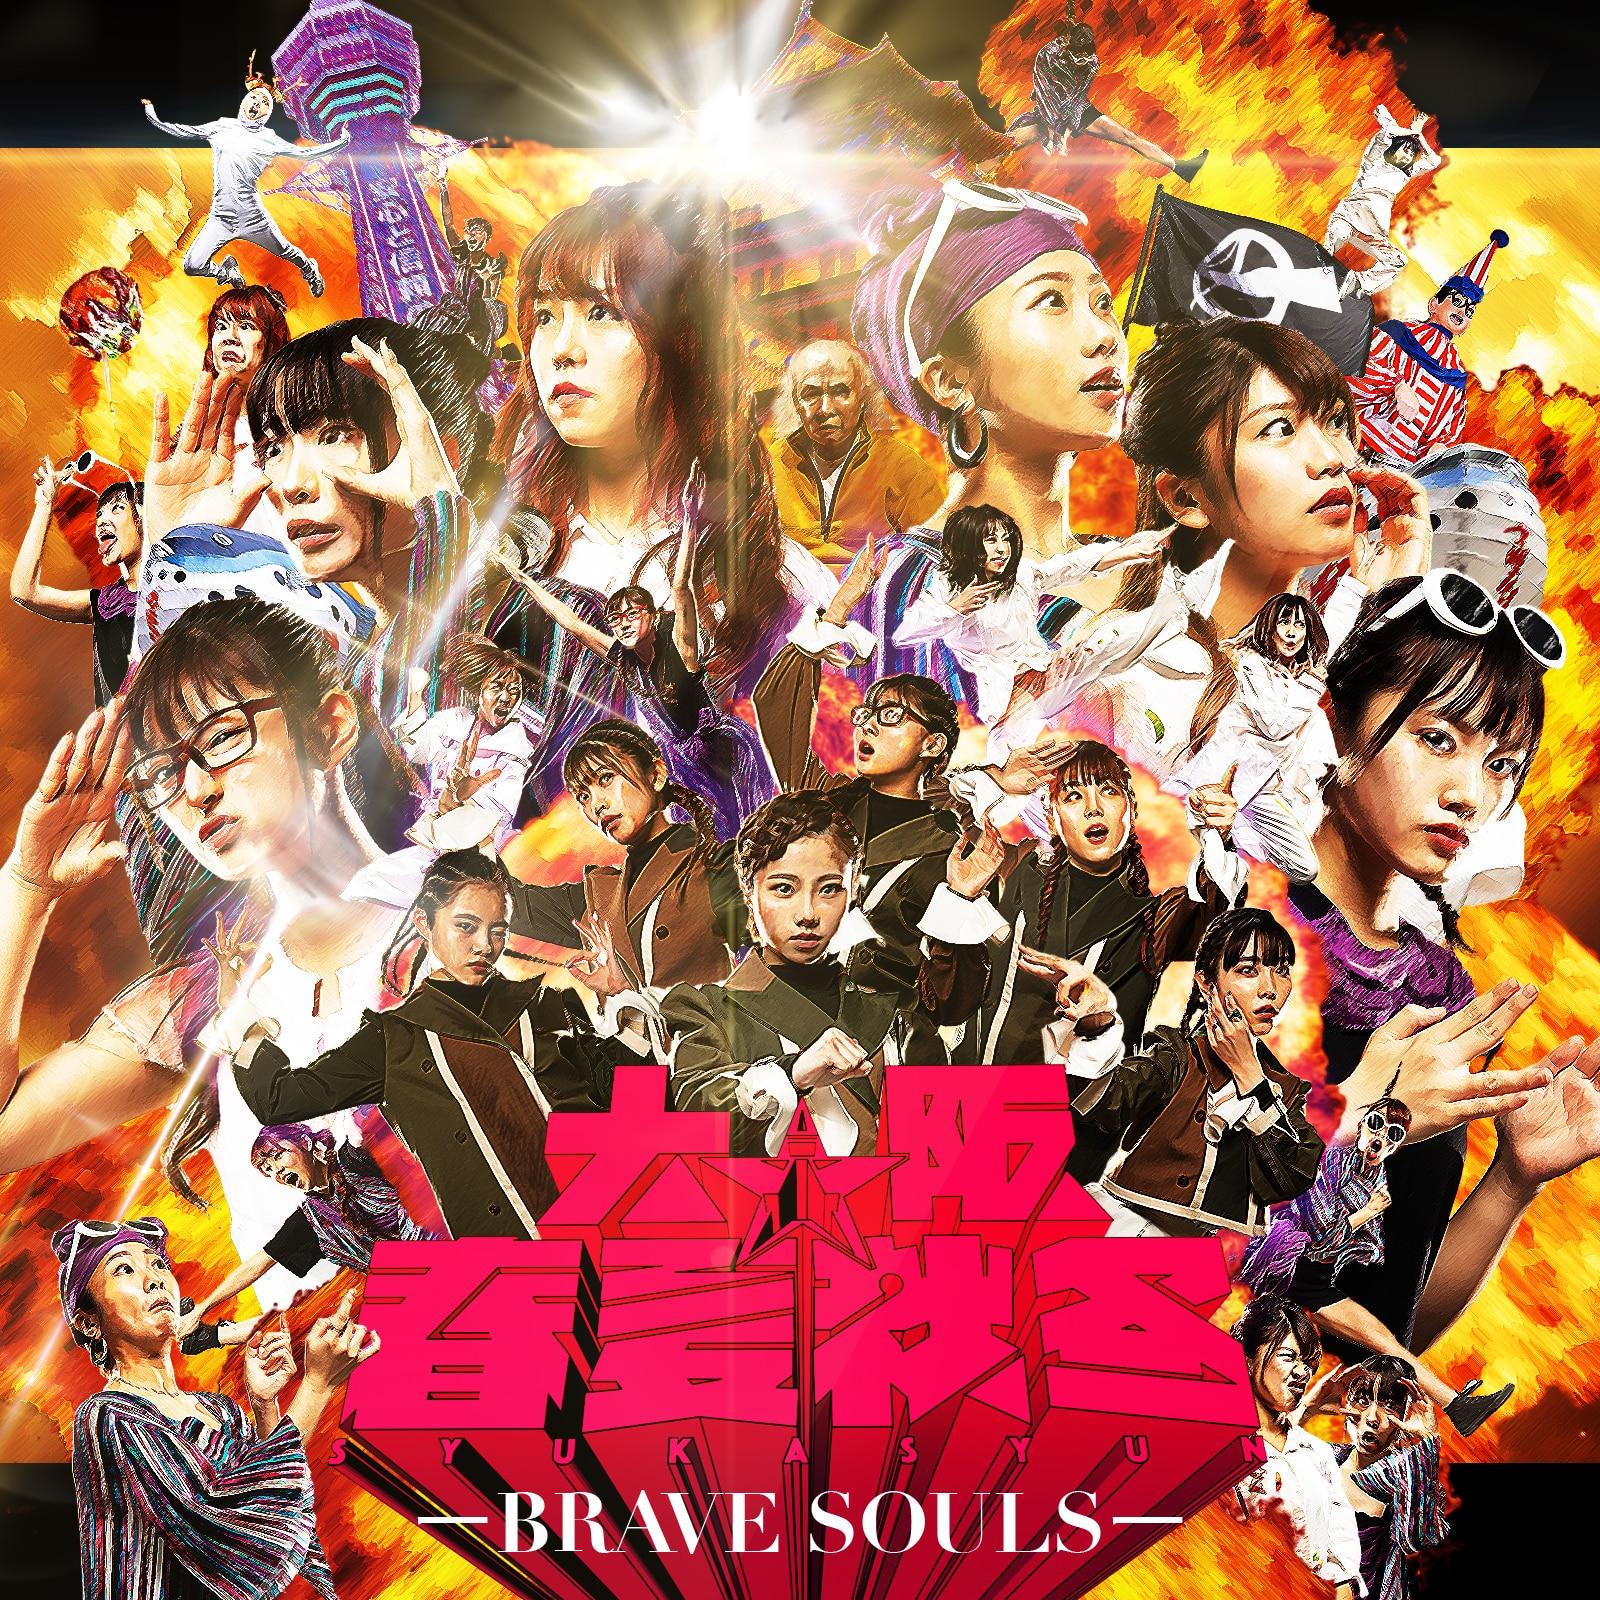 『BRAVE SOULS』